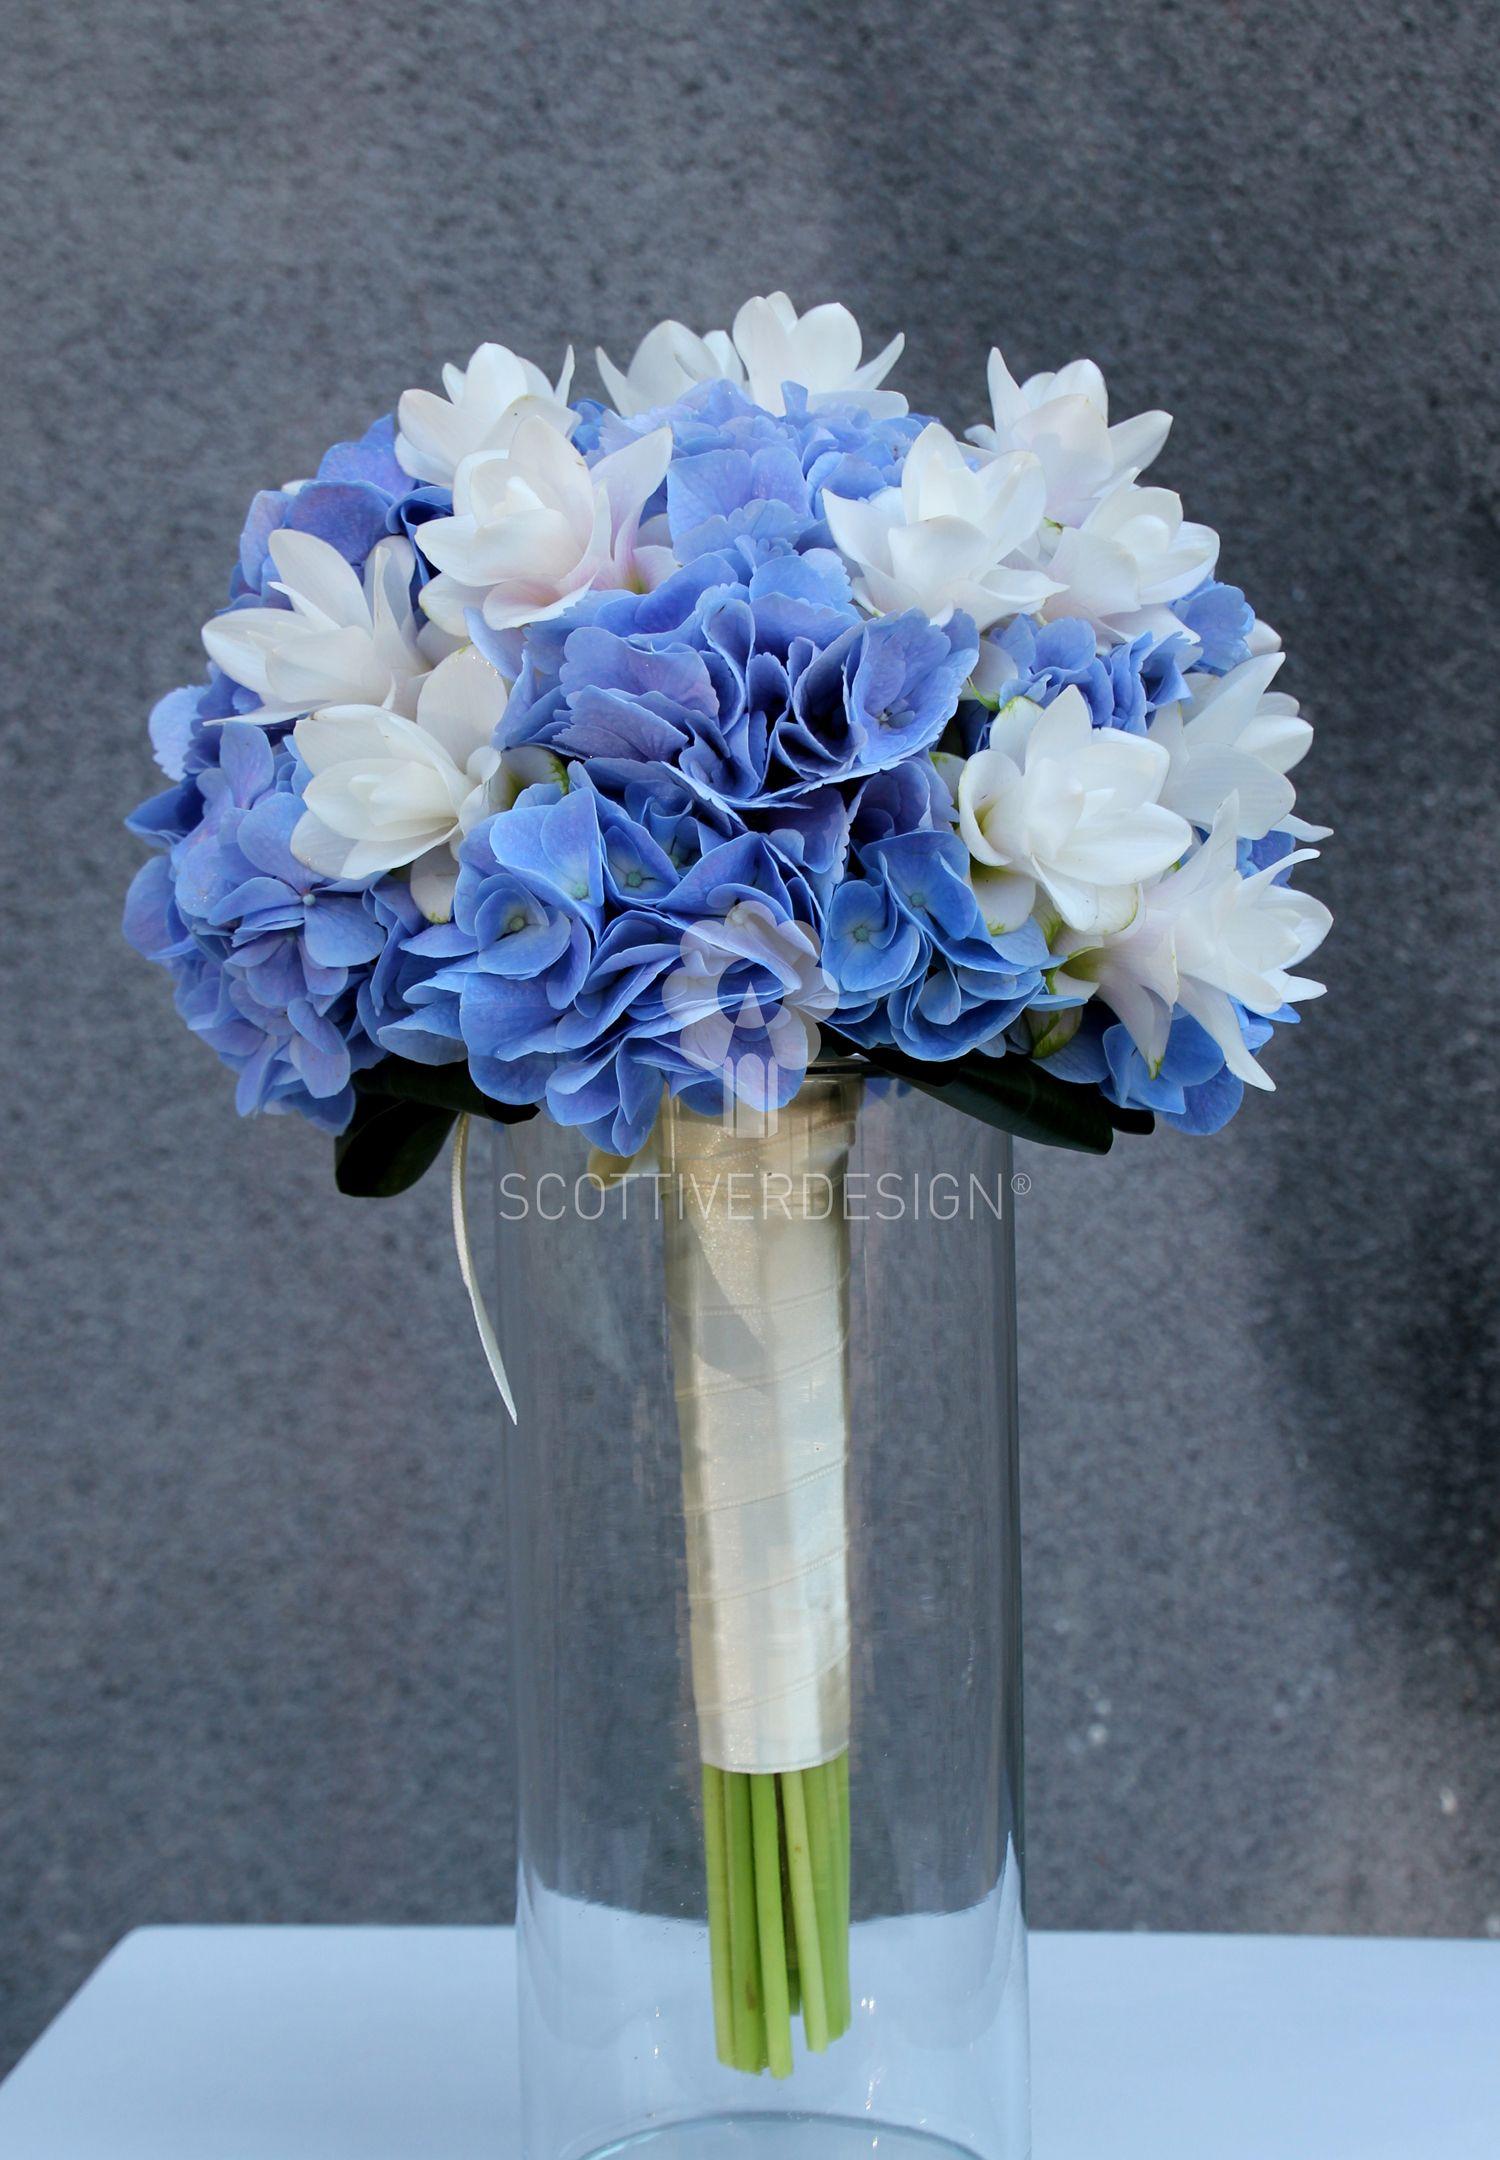 Blue and white wedding decor  bouquet con ortensie e curcuma  weddings  Pinterest  Wedding and